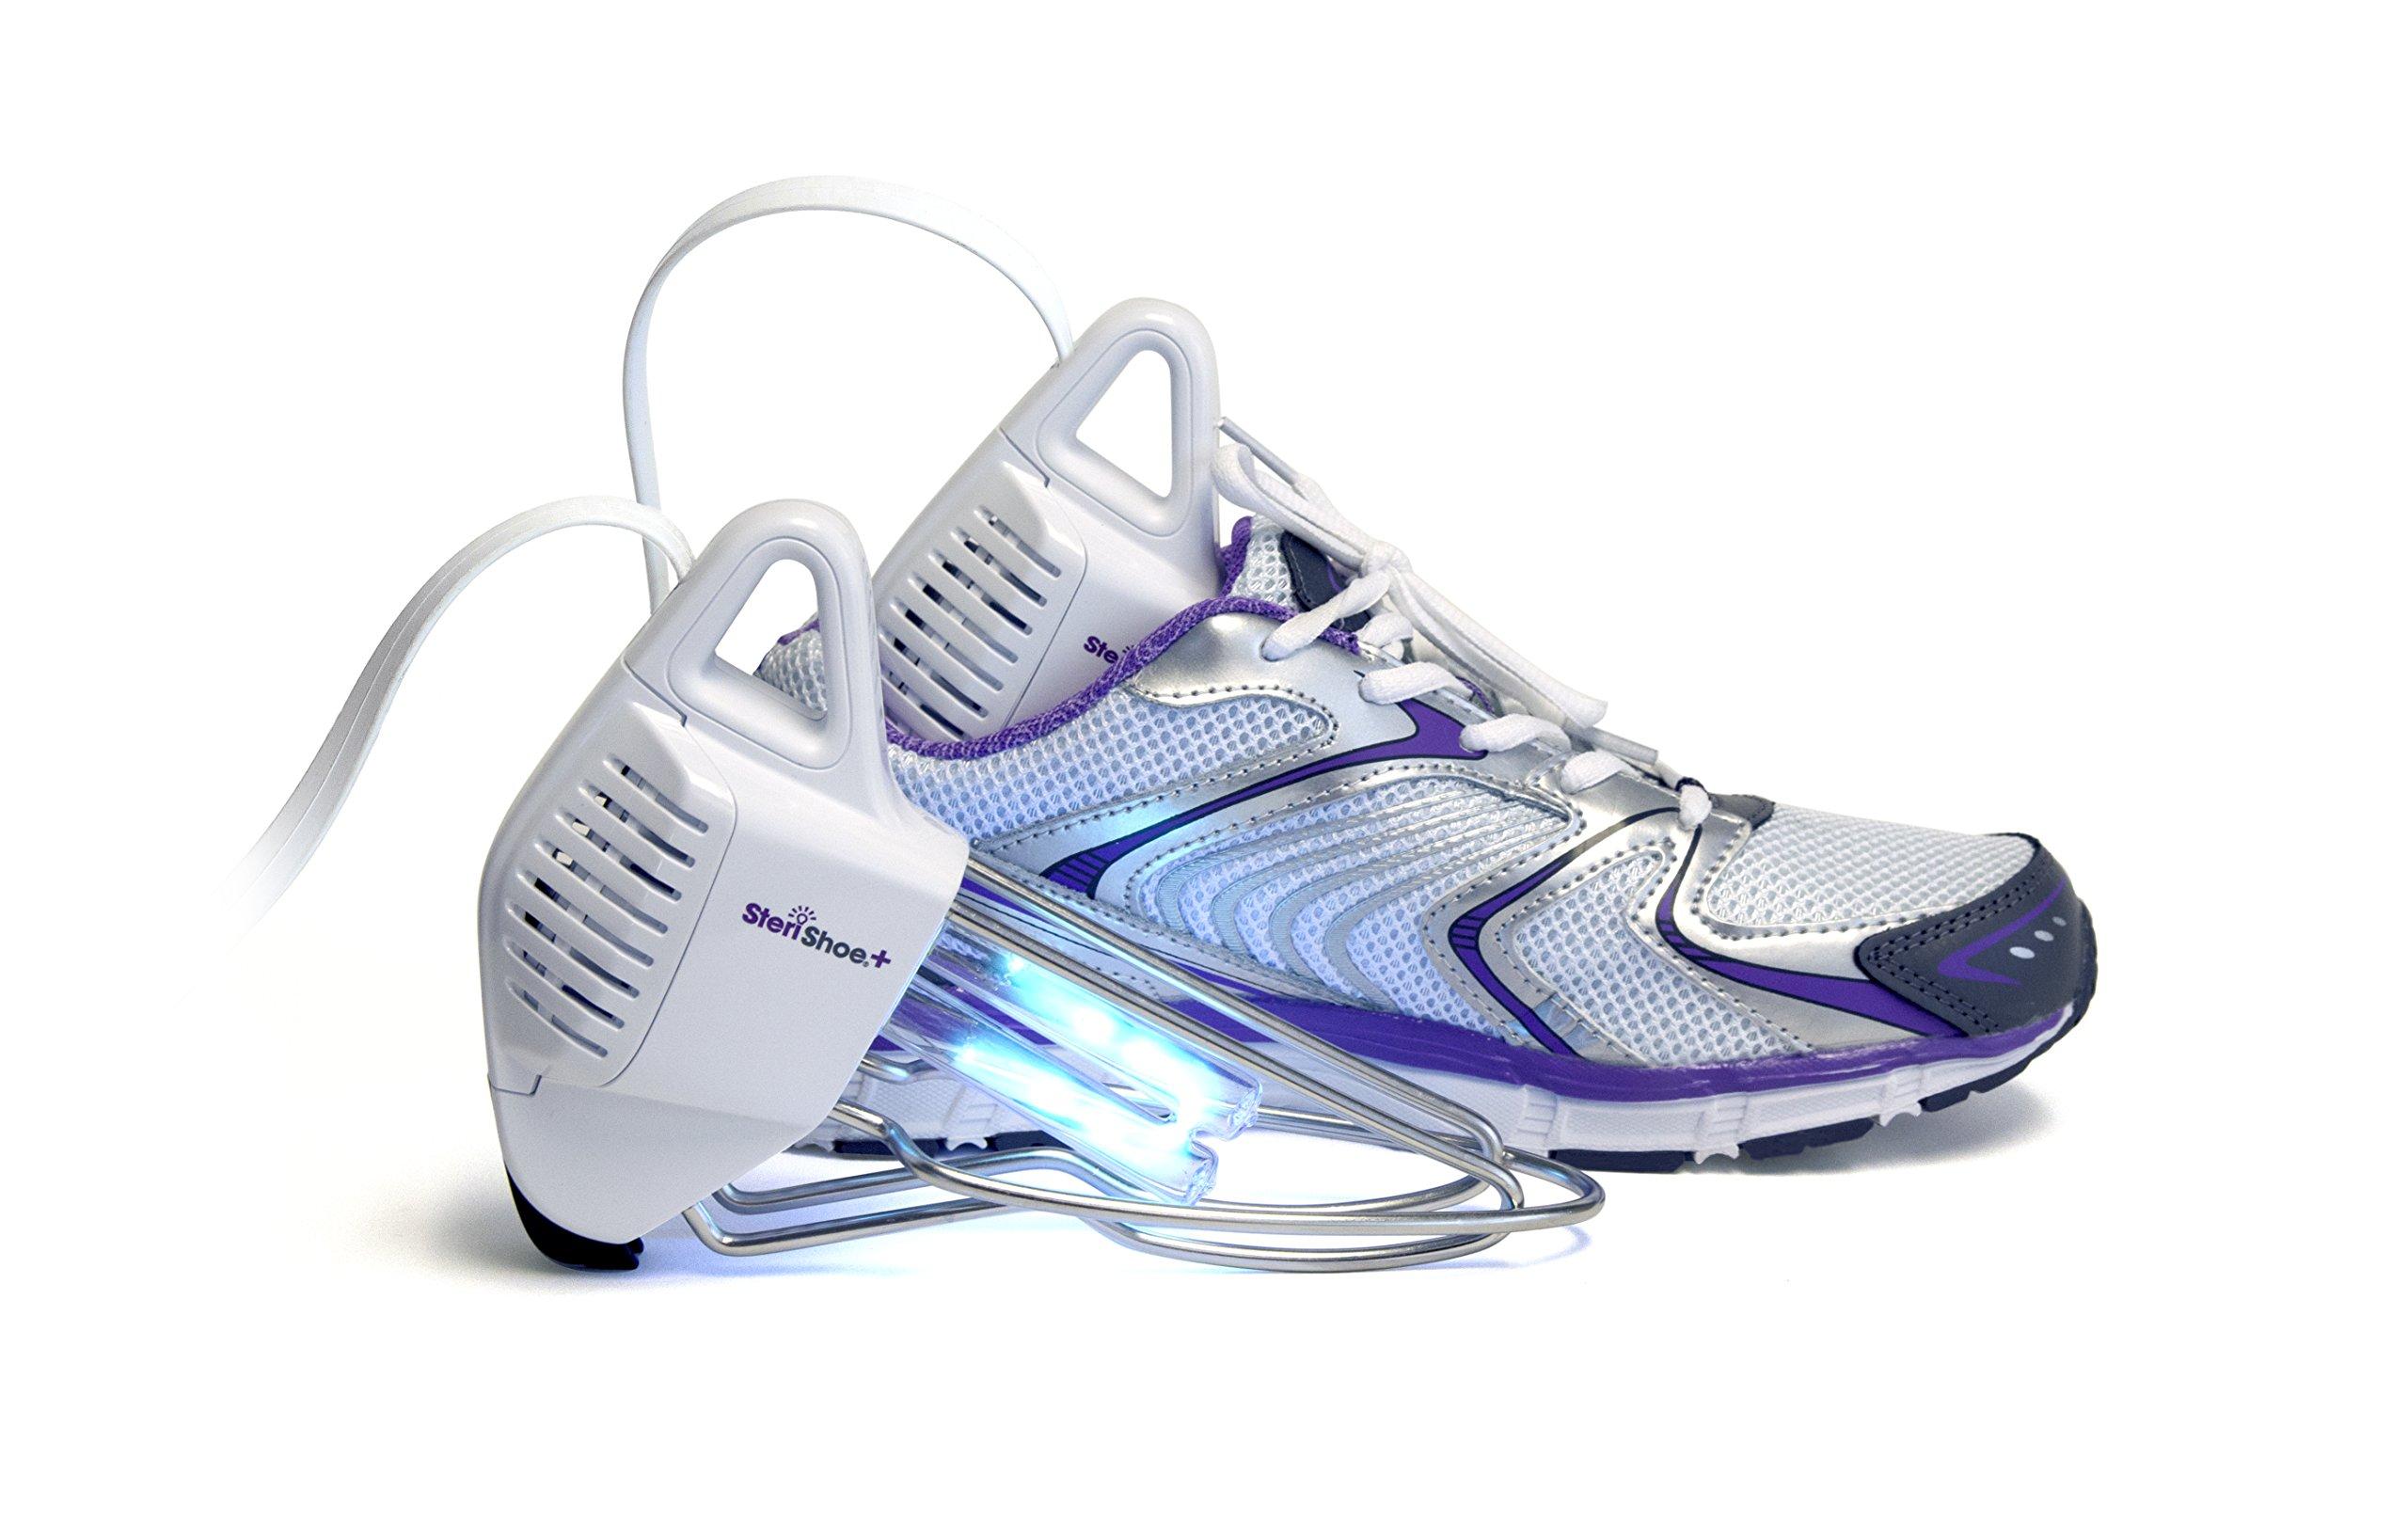 Amazon.com: SteriShoe+ Ultraviolet Shoe